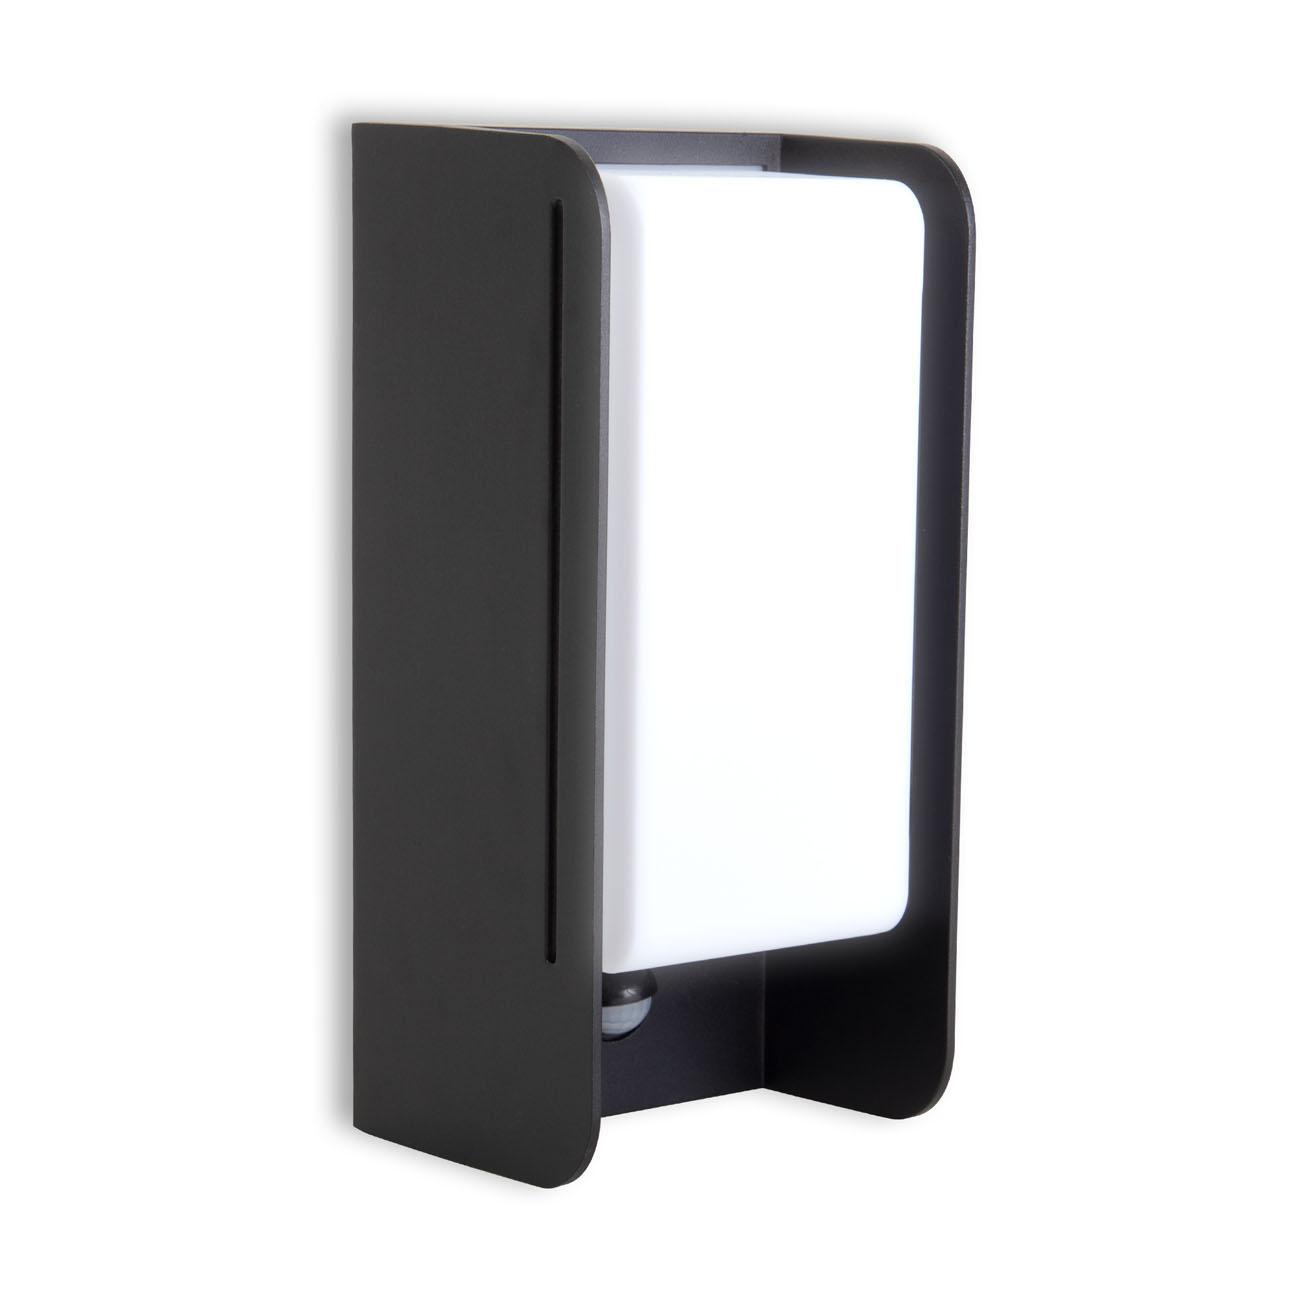 LED Außenleuchte Wandlampe mit Sensor E27